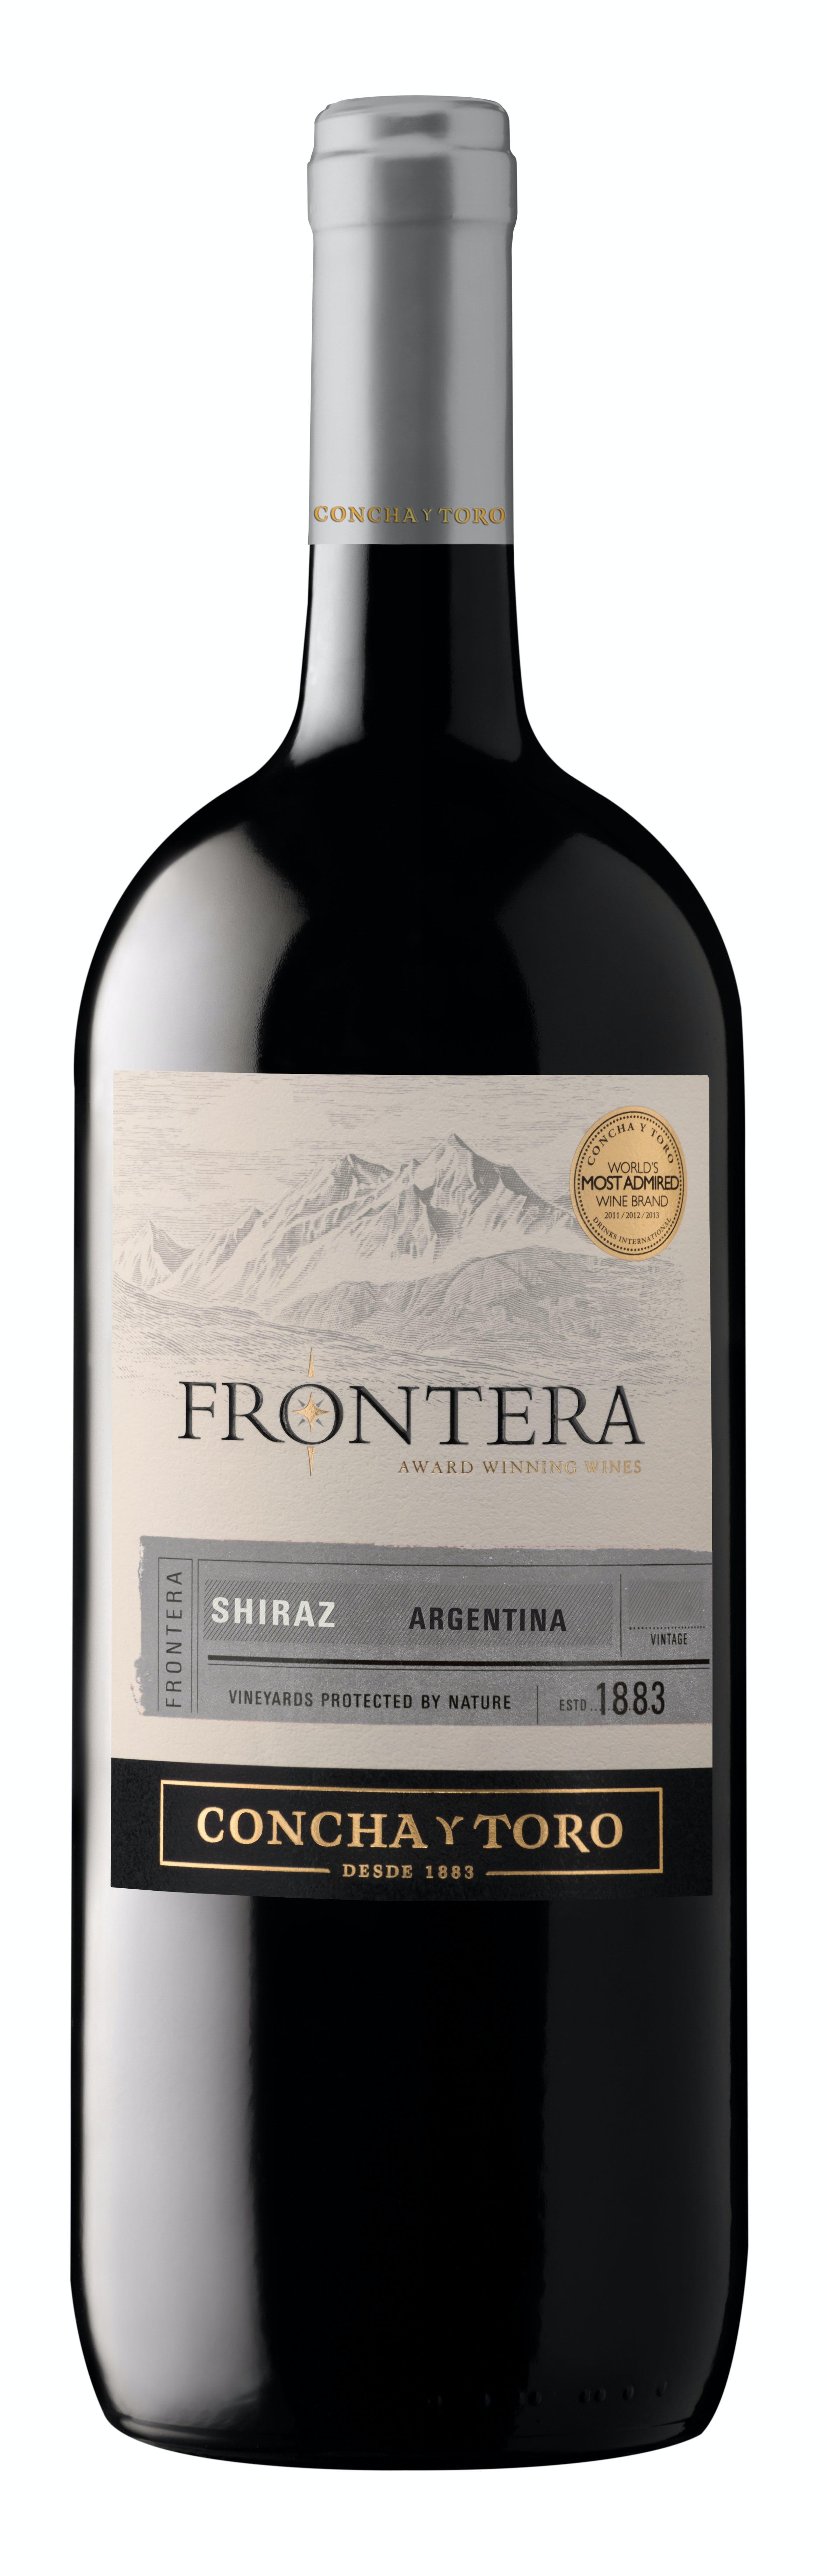 Concha Y Toro Frontera Shiraz 15L